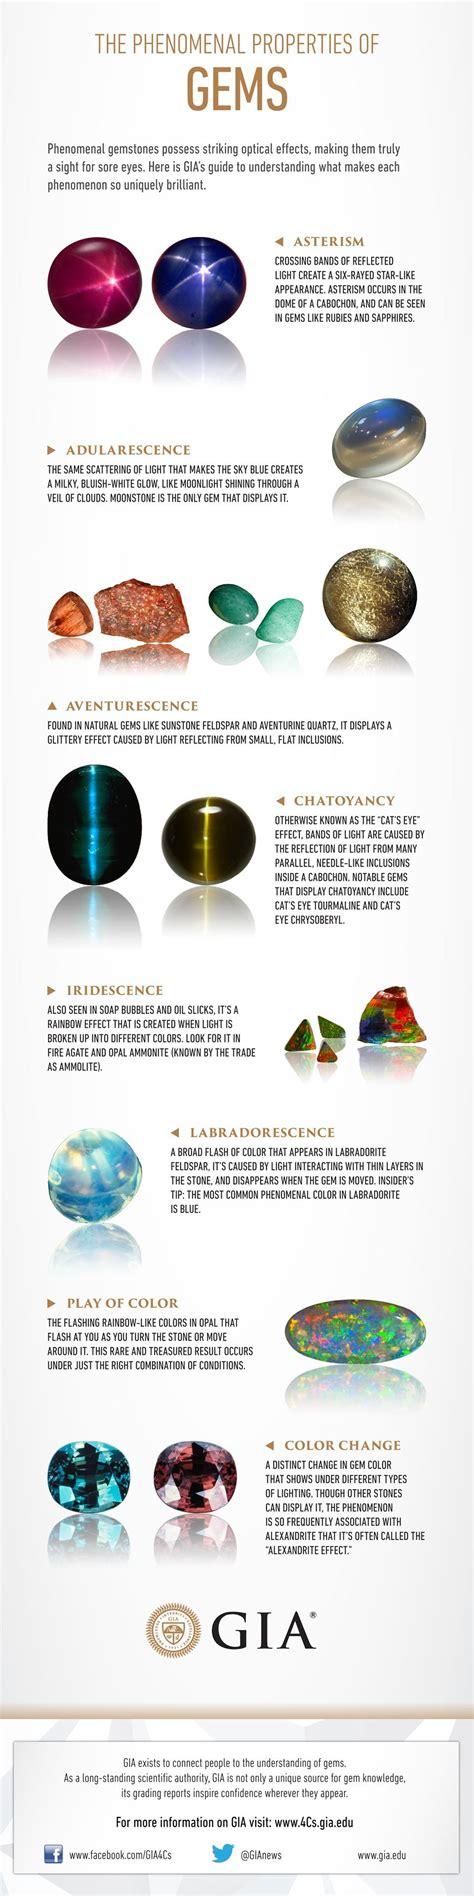 the phenomenal properties of gems 081114 more